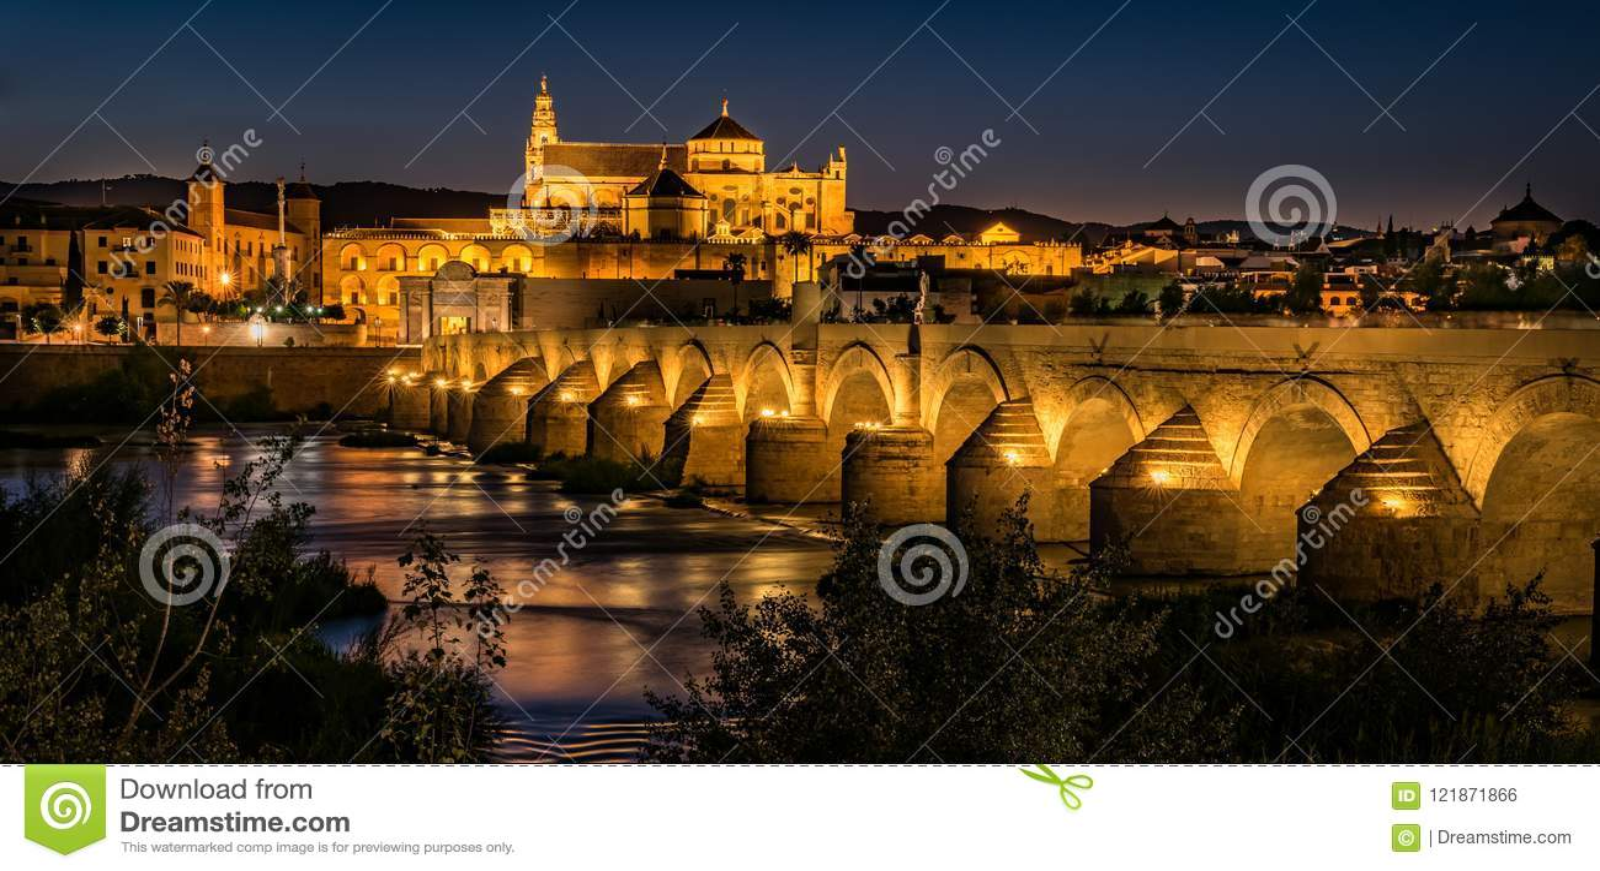 La catedral de la mezquita en Córdoba por noche